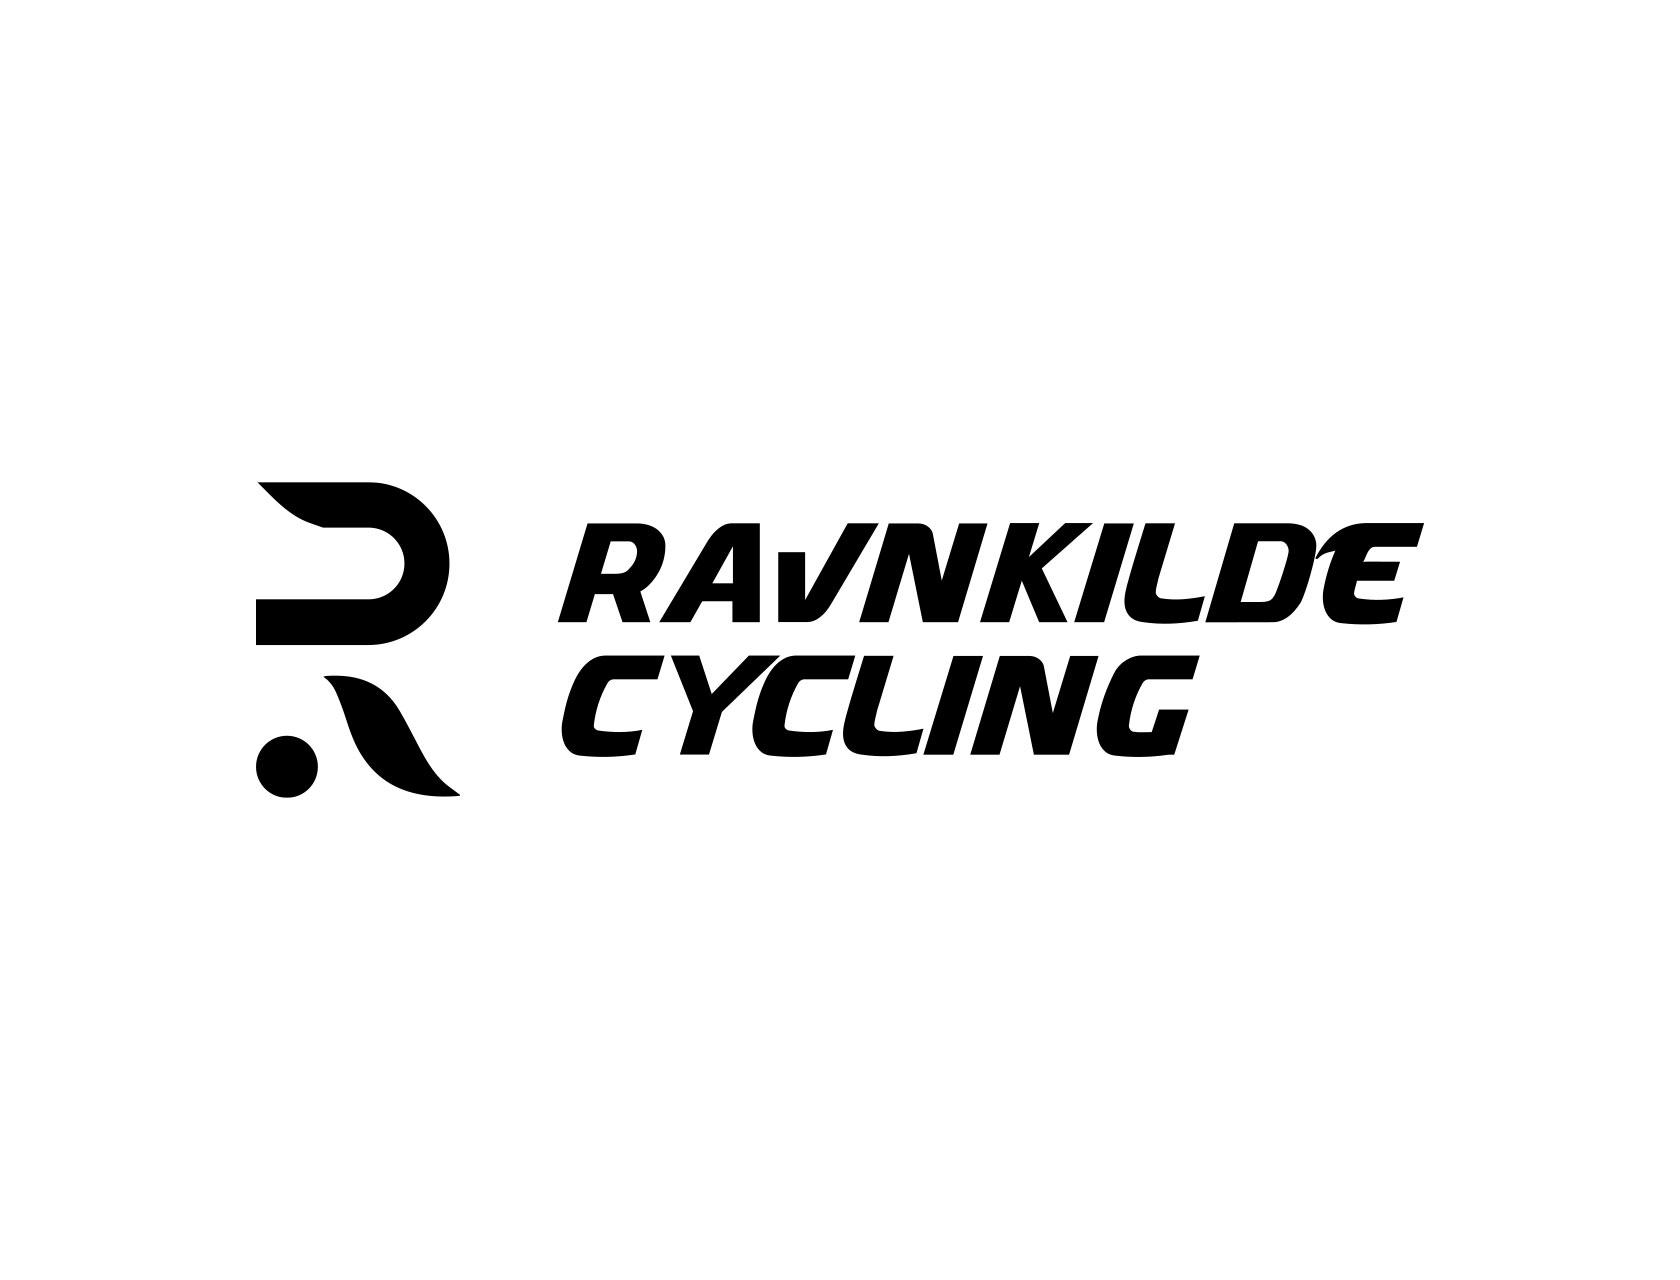 Ravnkilde cycling logo